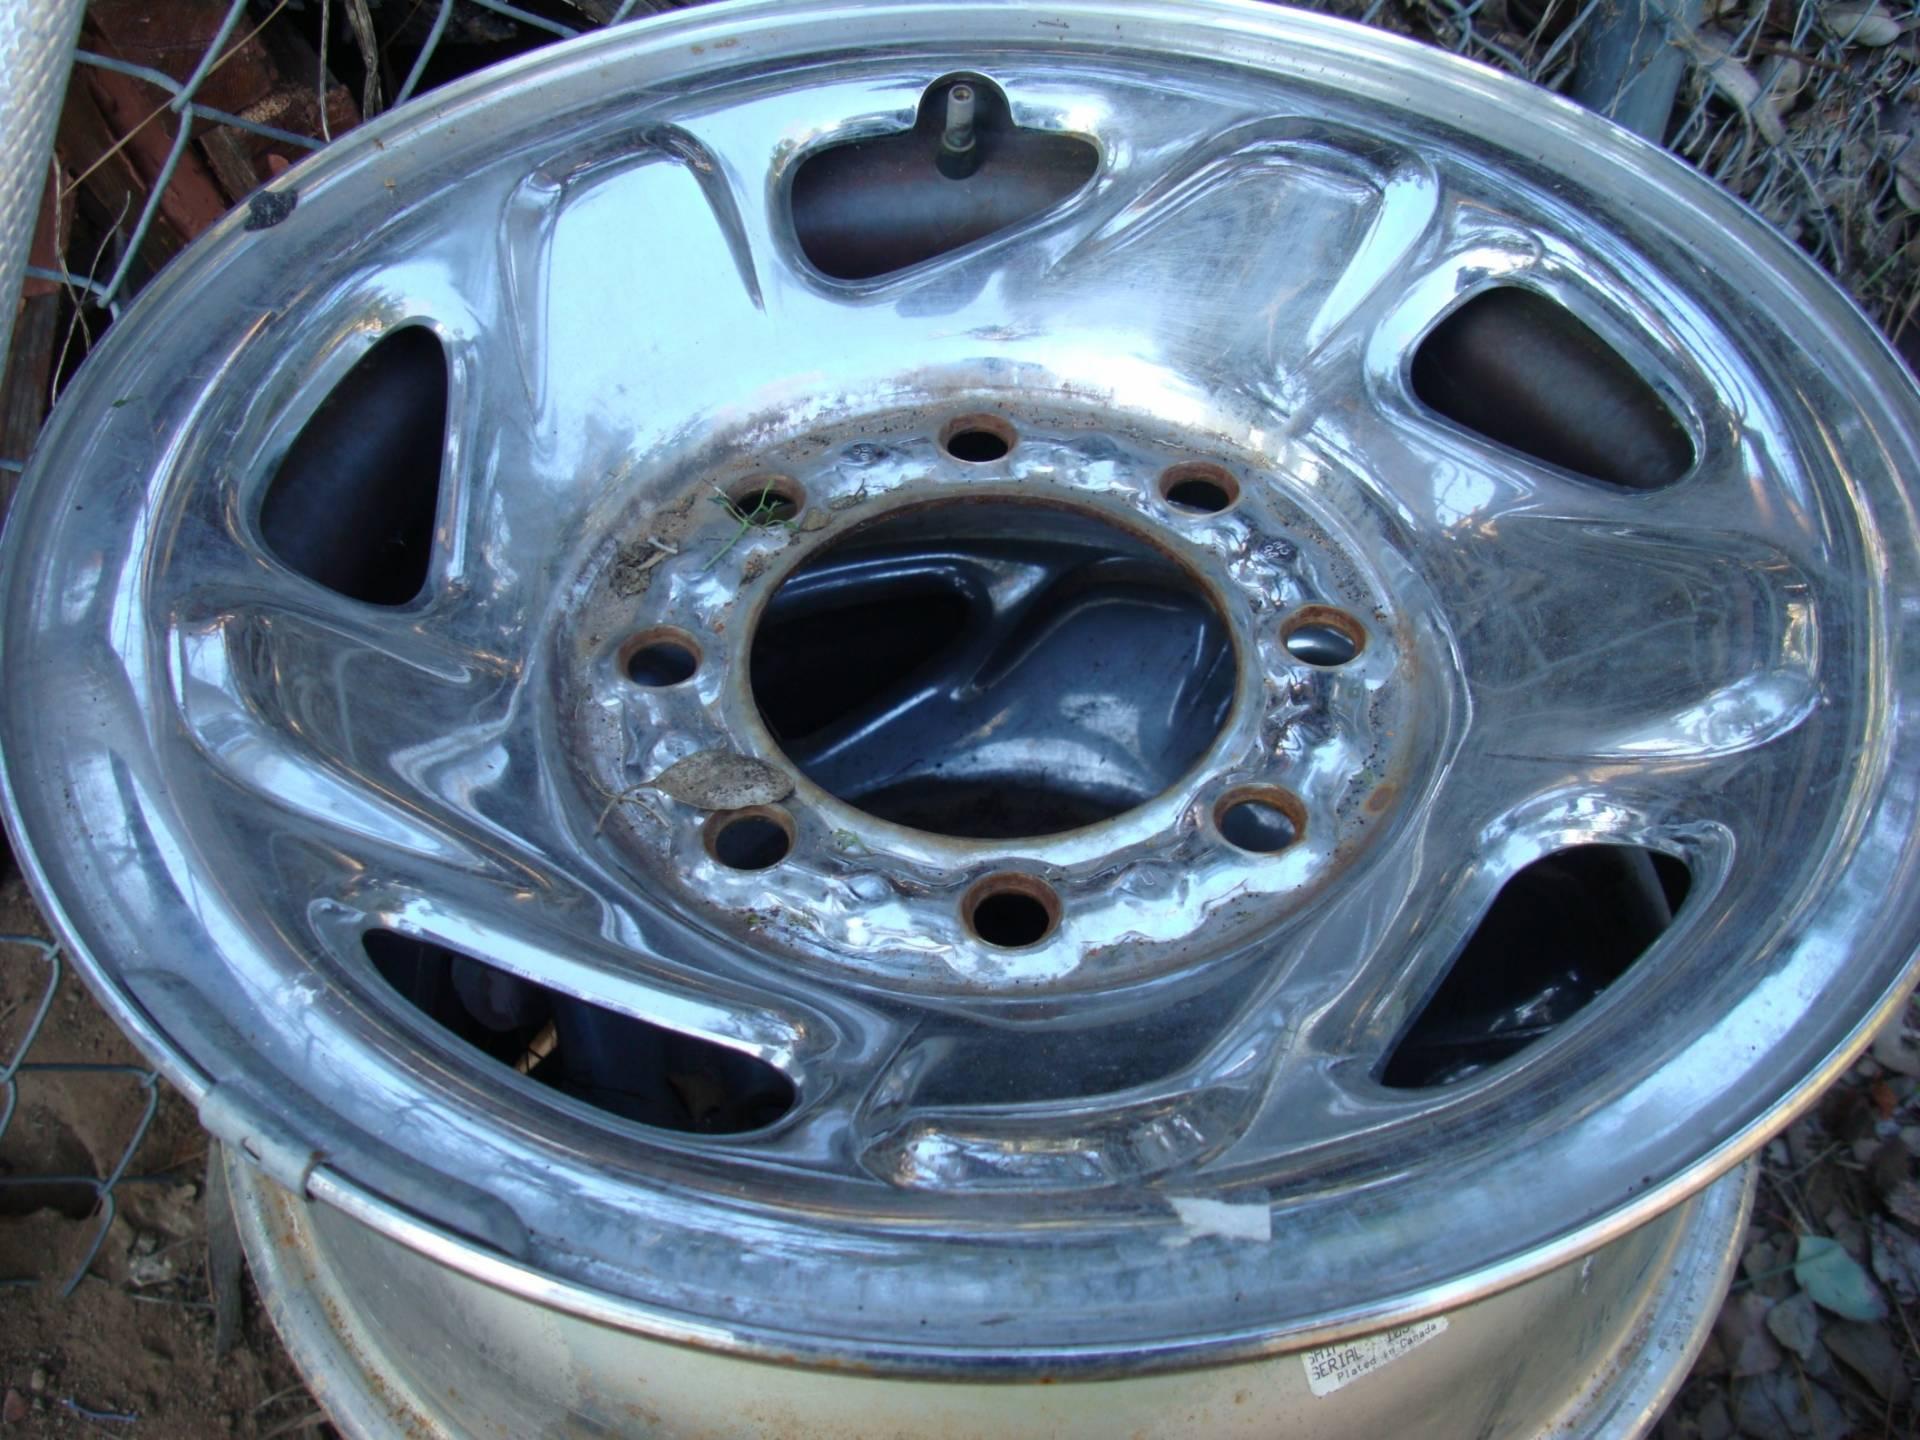 stock dodge 8 lug chrome rims and hub caps | Bloodydecks